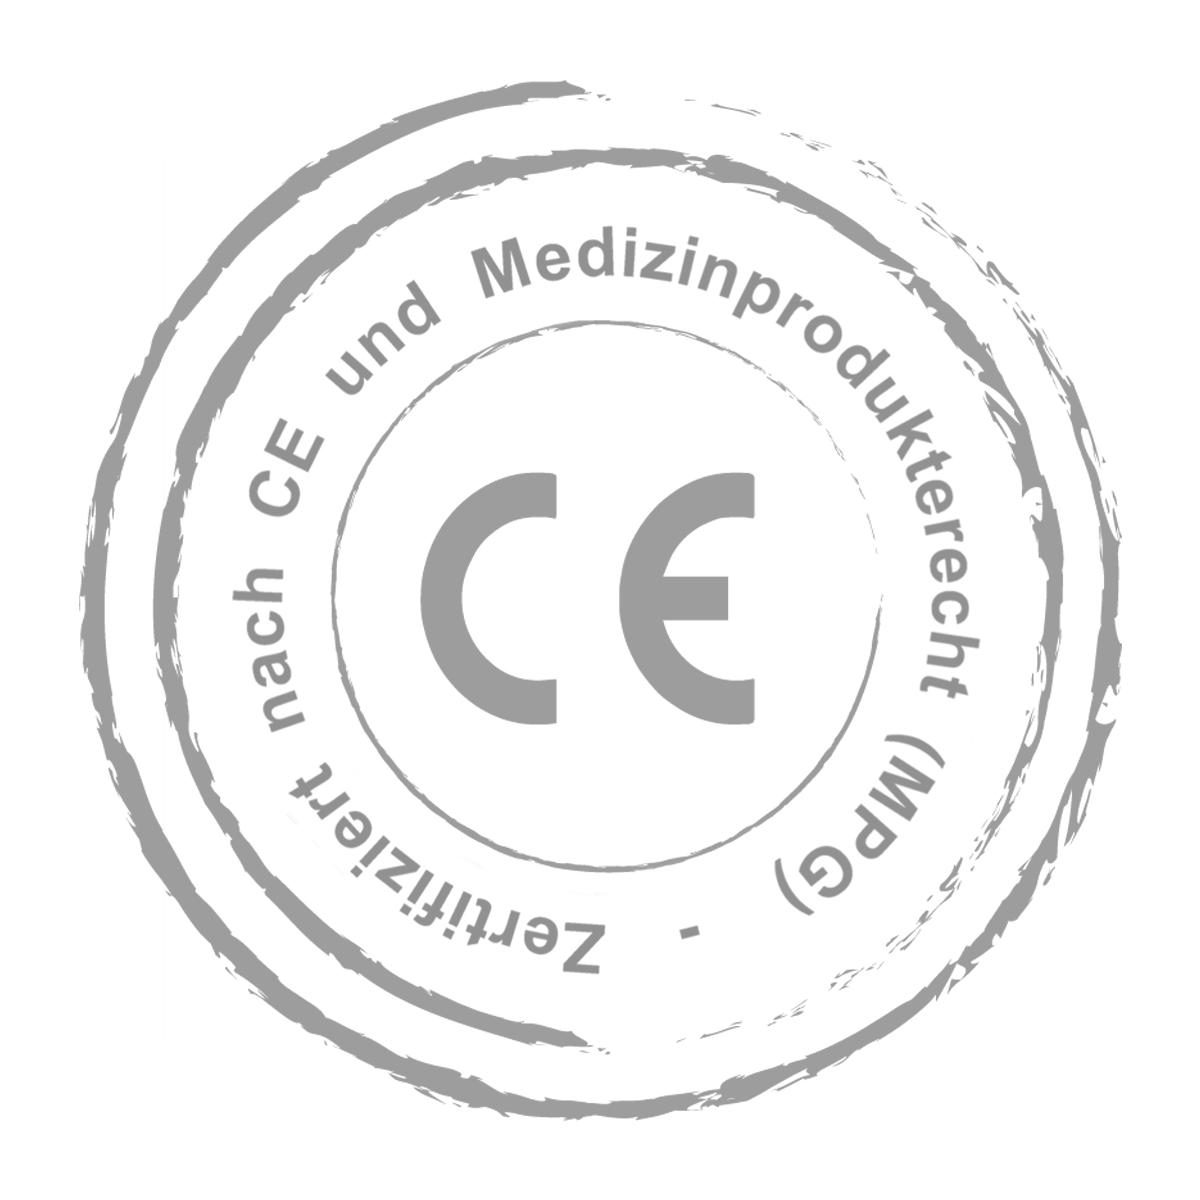 CE-Stempel_2pOPWg8eBumYUR